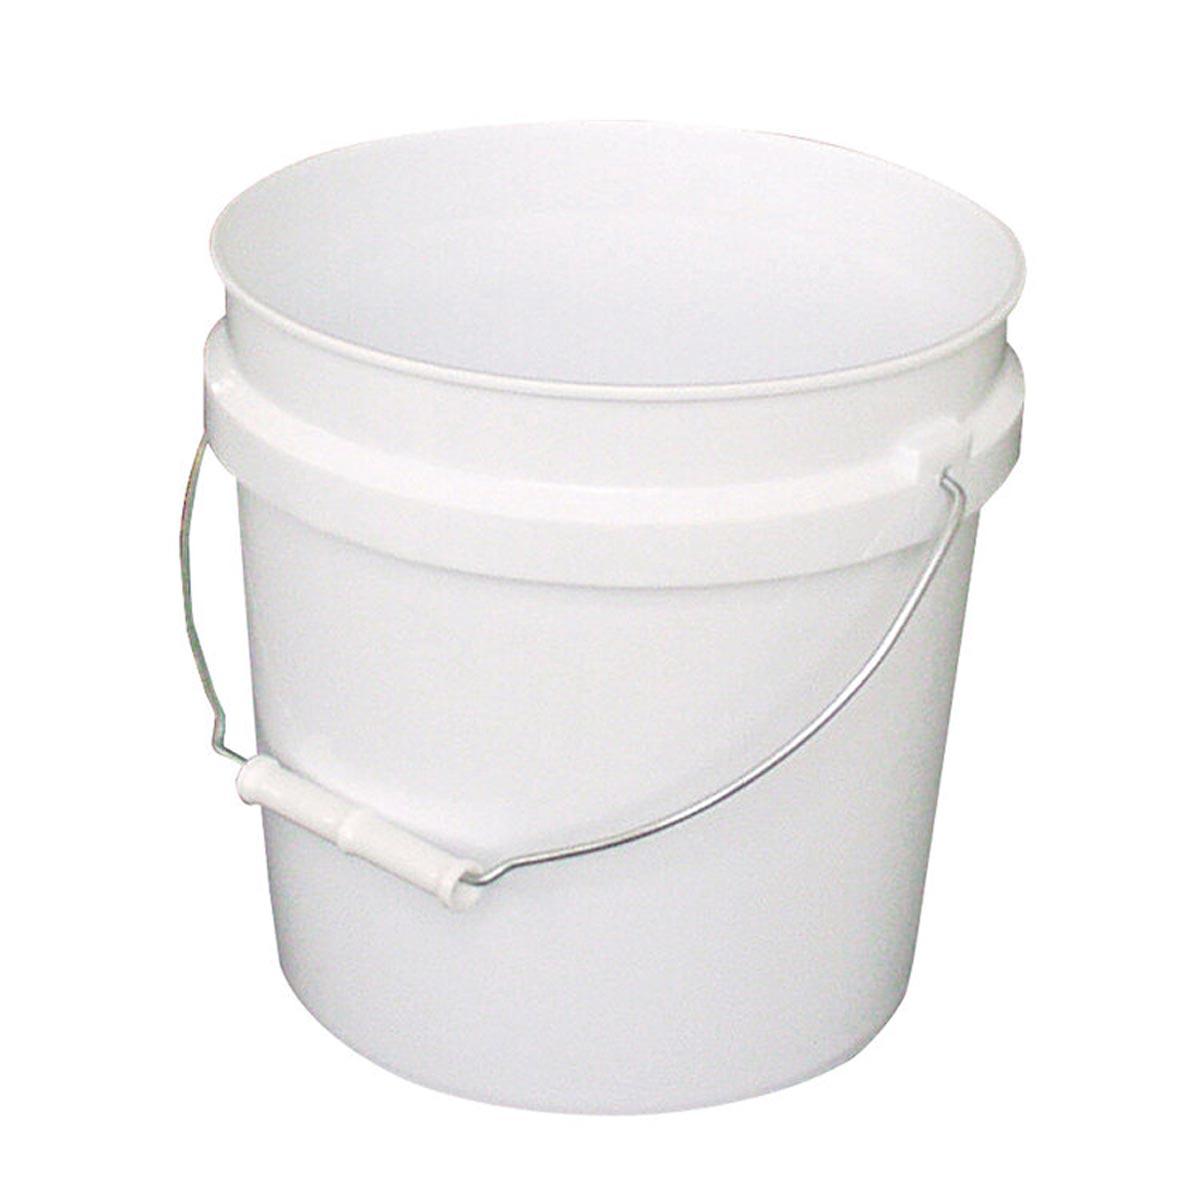 2 Gallon Plastic Pail